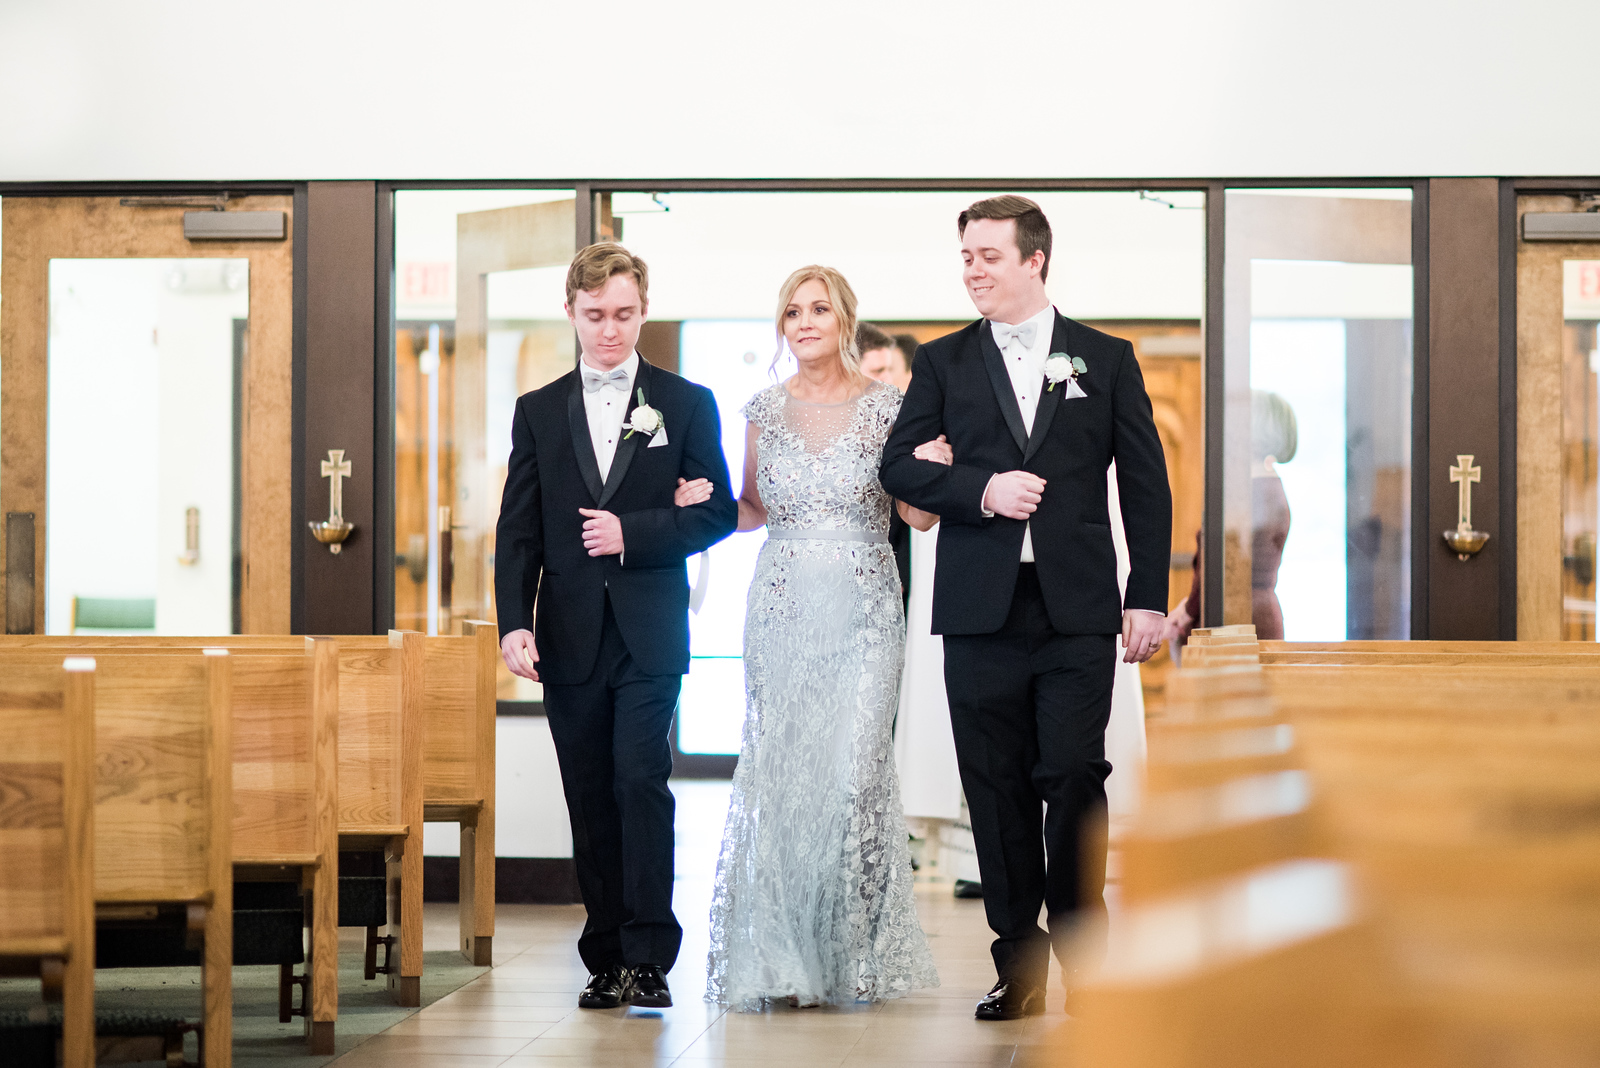 MollyandBryce_Wedding-304